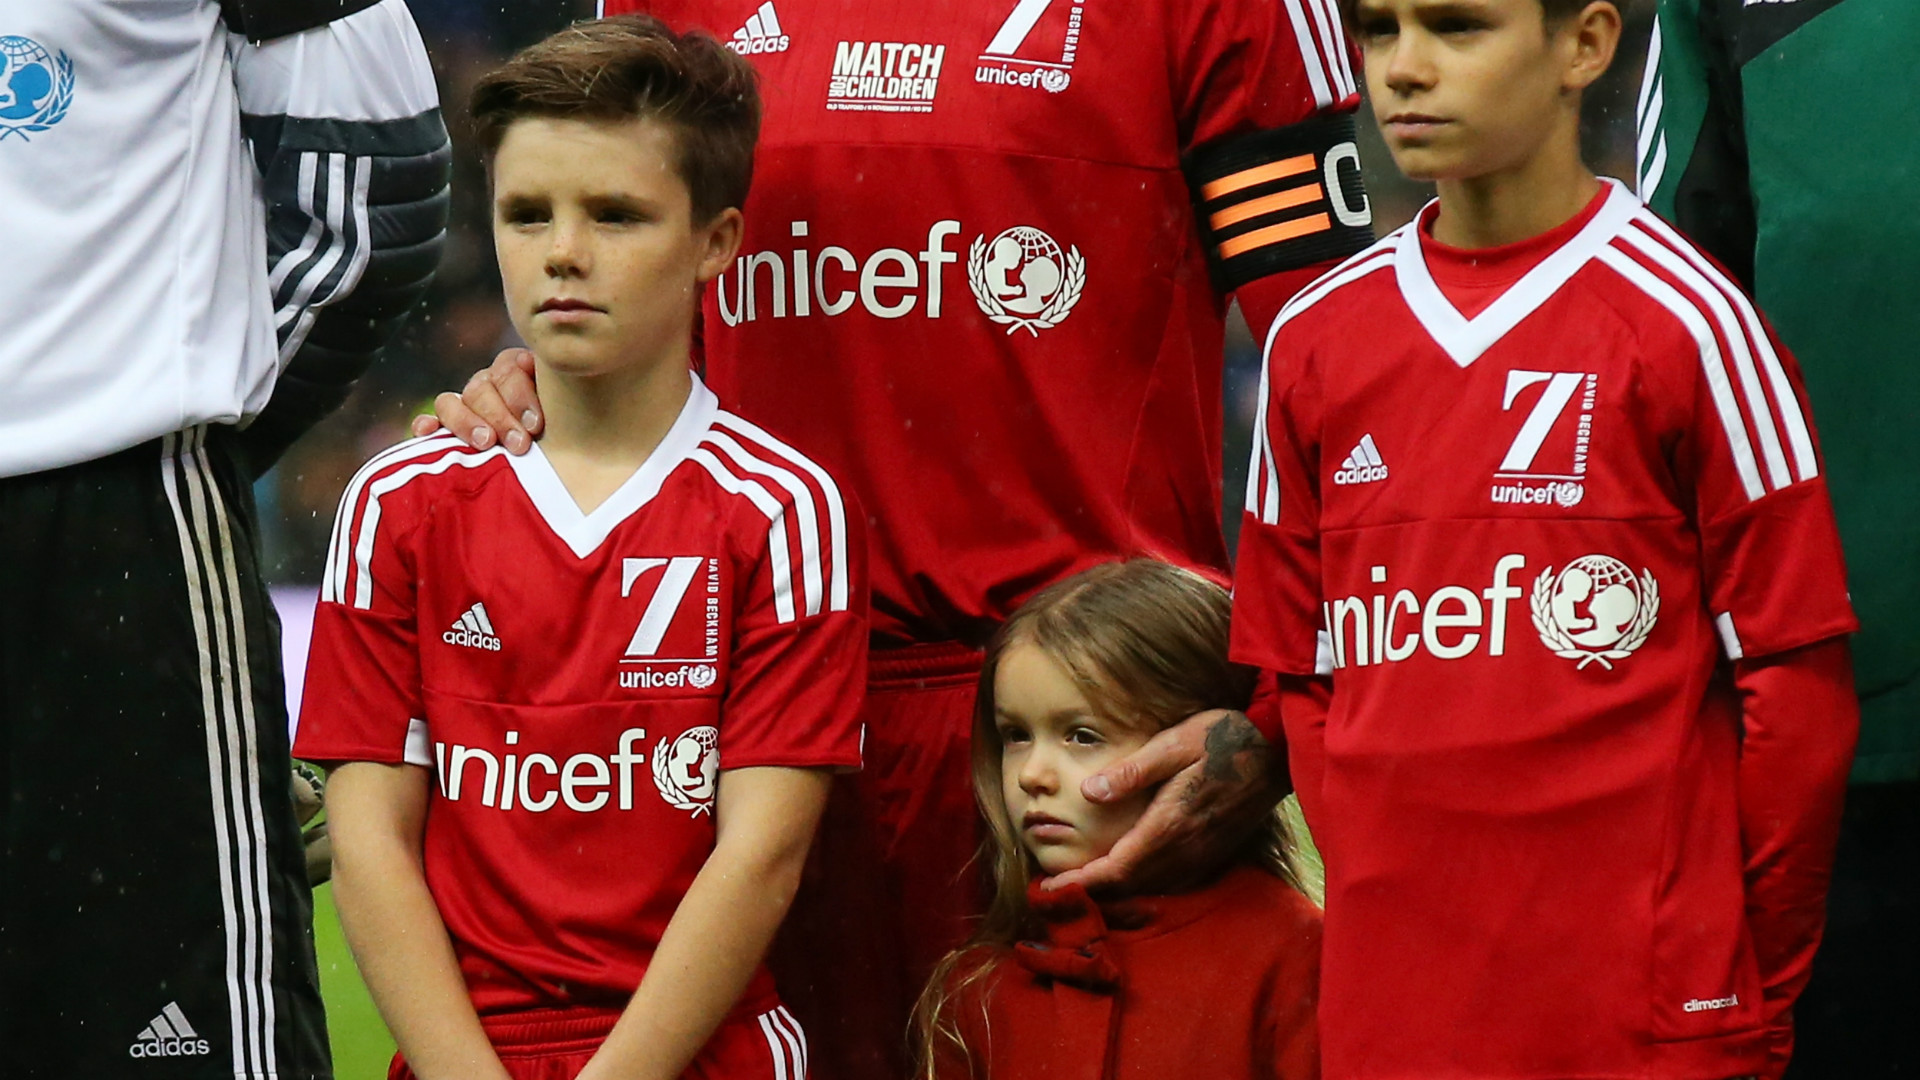 david beckham toddler jersey